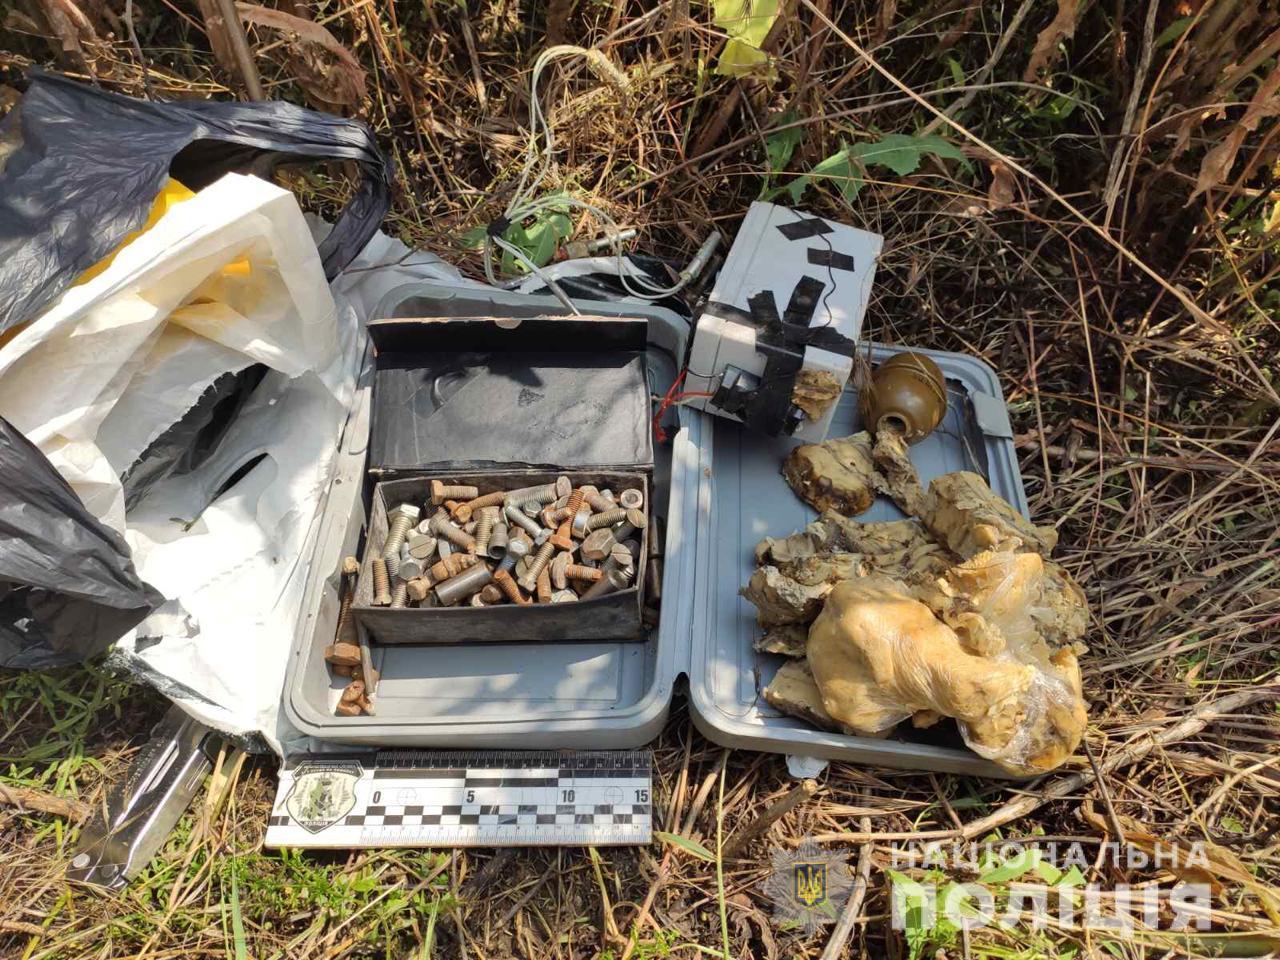 Оружие, взрывчатка и наркотики на 400 000 гривен   Прихист